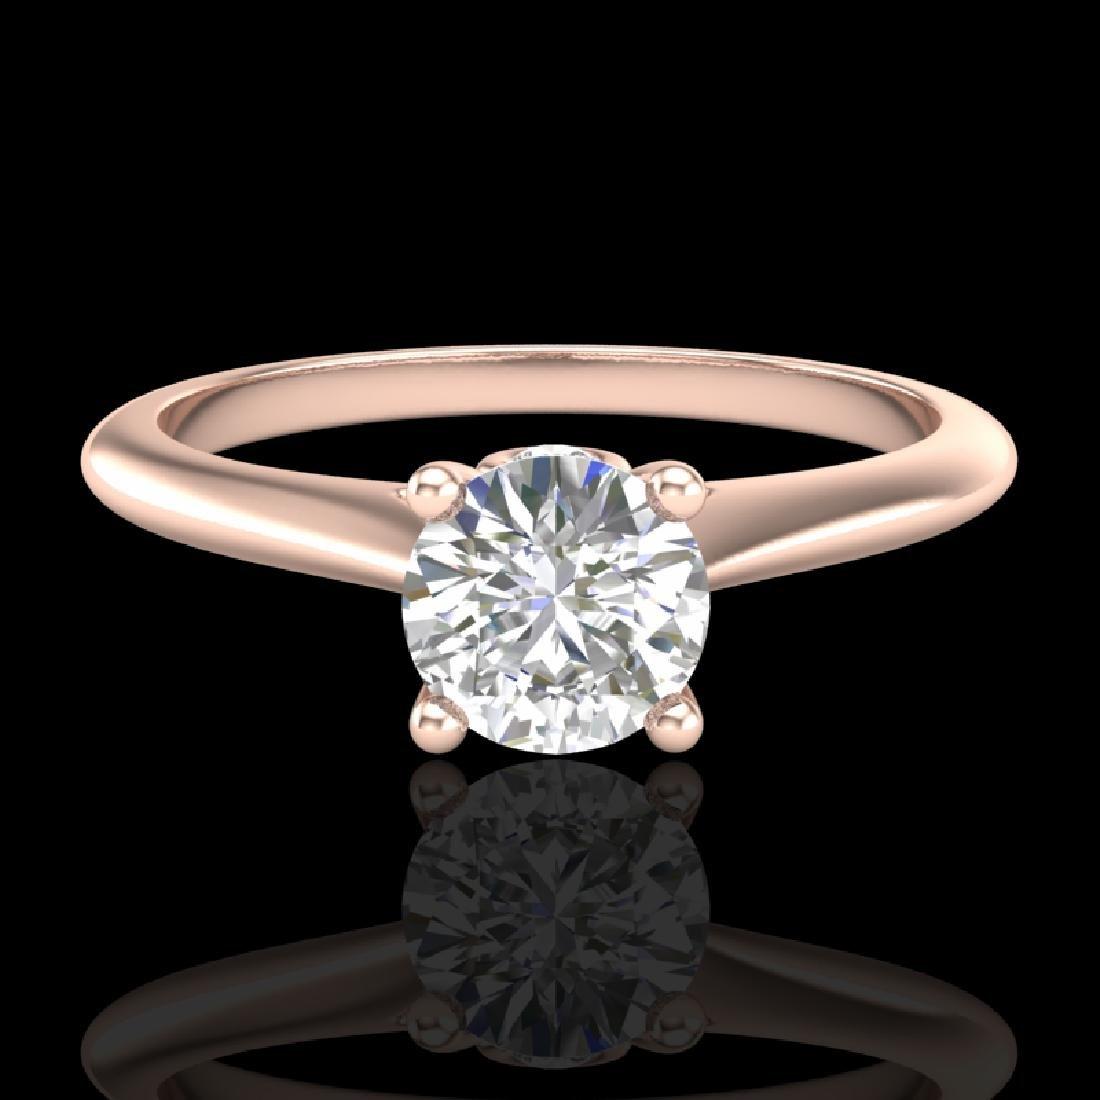 0.56 CTW VS/SI Diamond Solitaire Art Deco Ring 18K Rose - 2